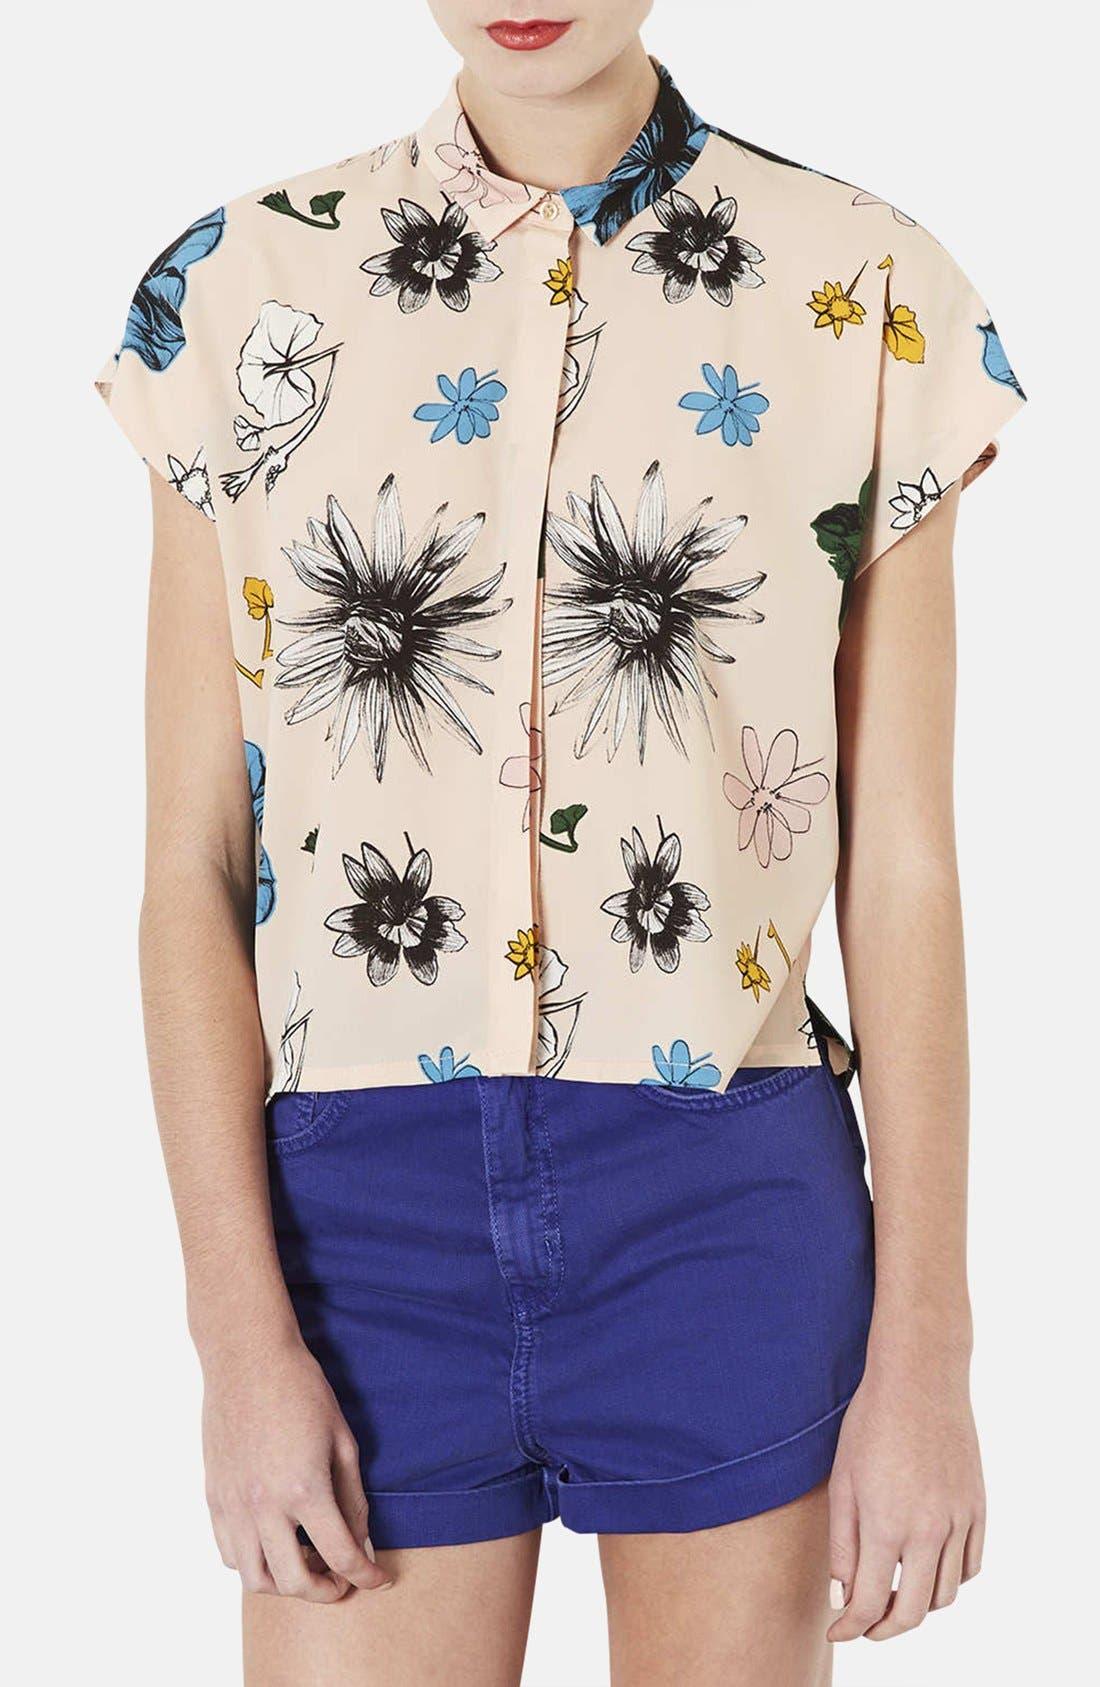 TOPSHOP, 'Sophie - Tokyo Bloom' Print Shirt, Main thumbnail 1, color, 250